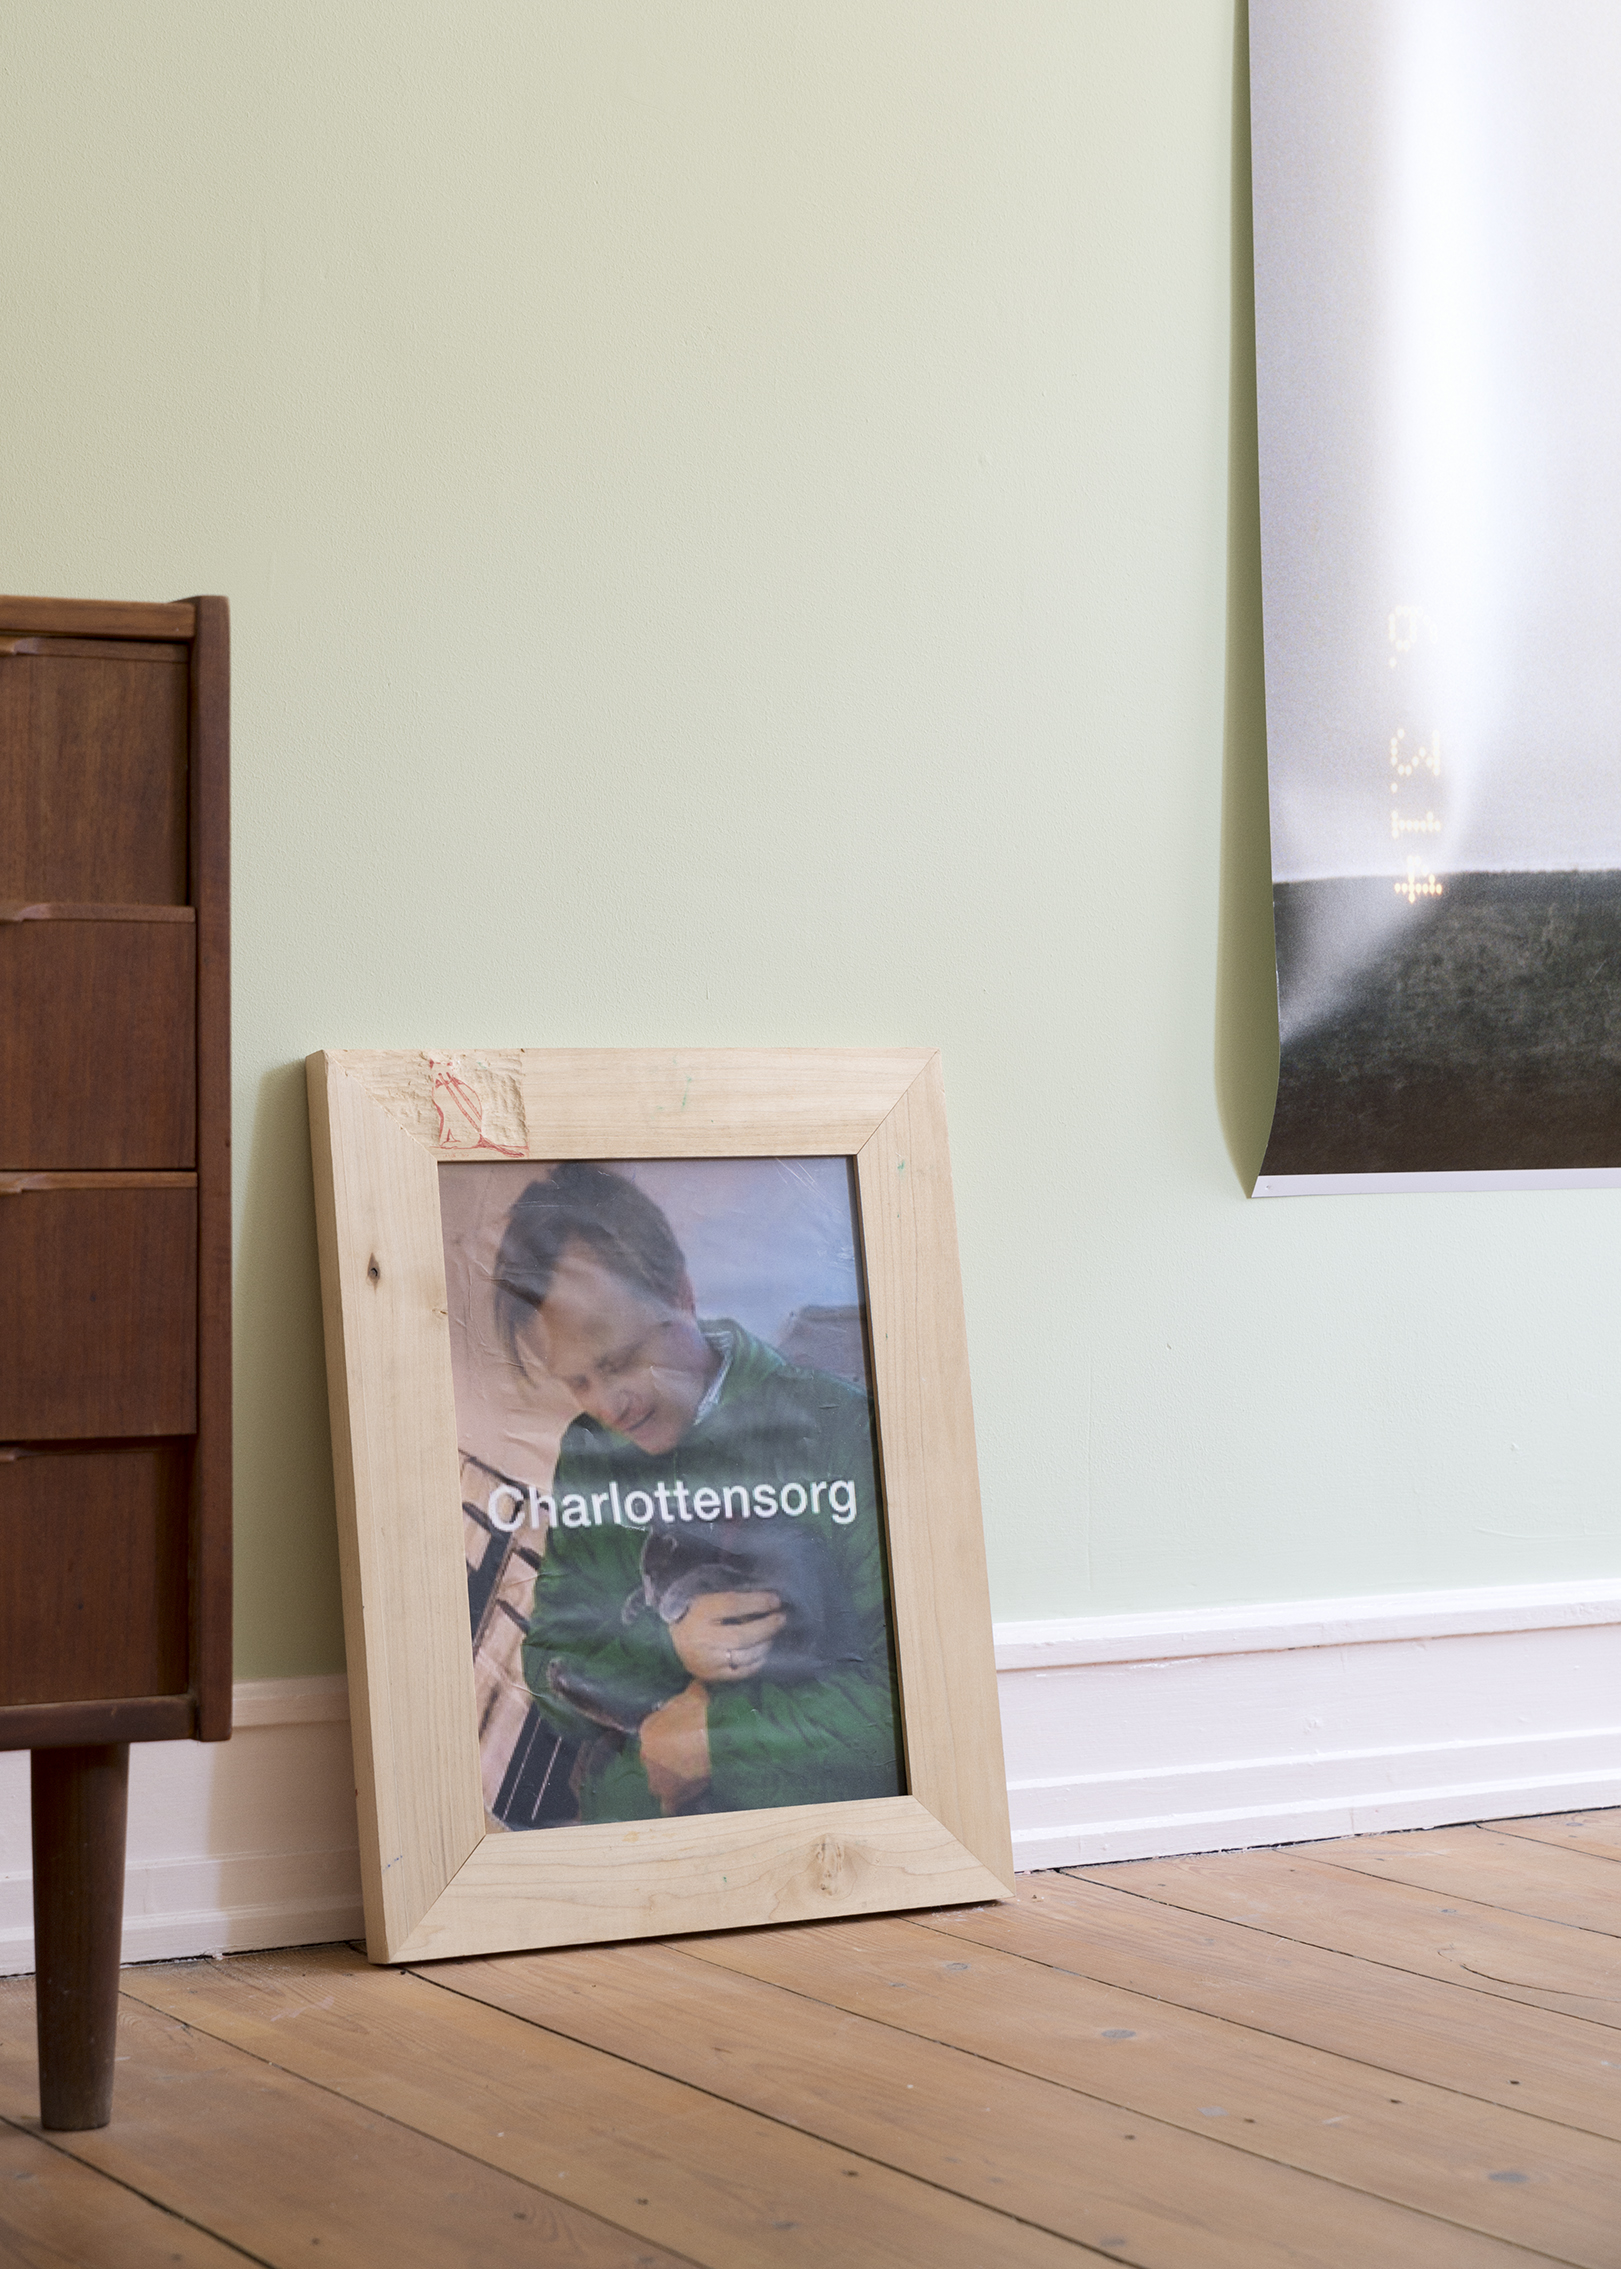 Carlottensorg (2015), inkjet print, wooden frame, 42.5x53.5cm, Sara Ursina